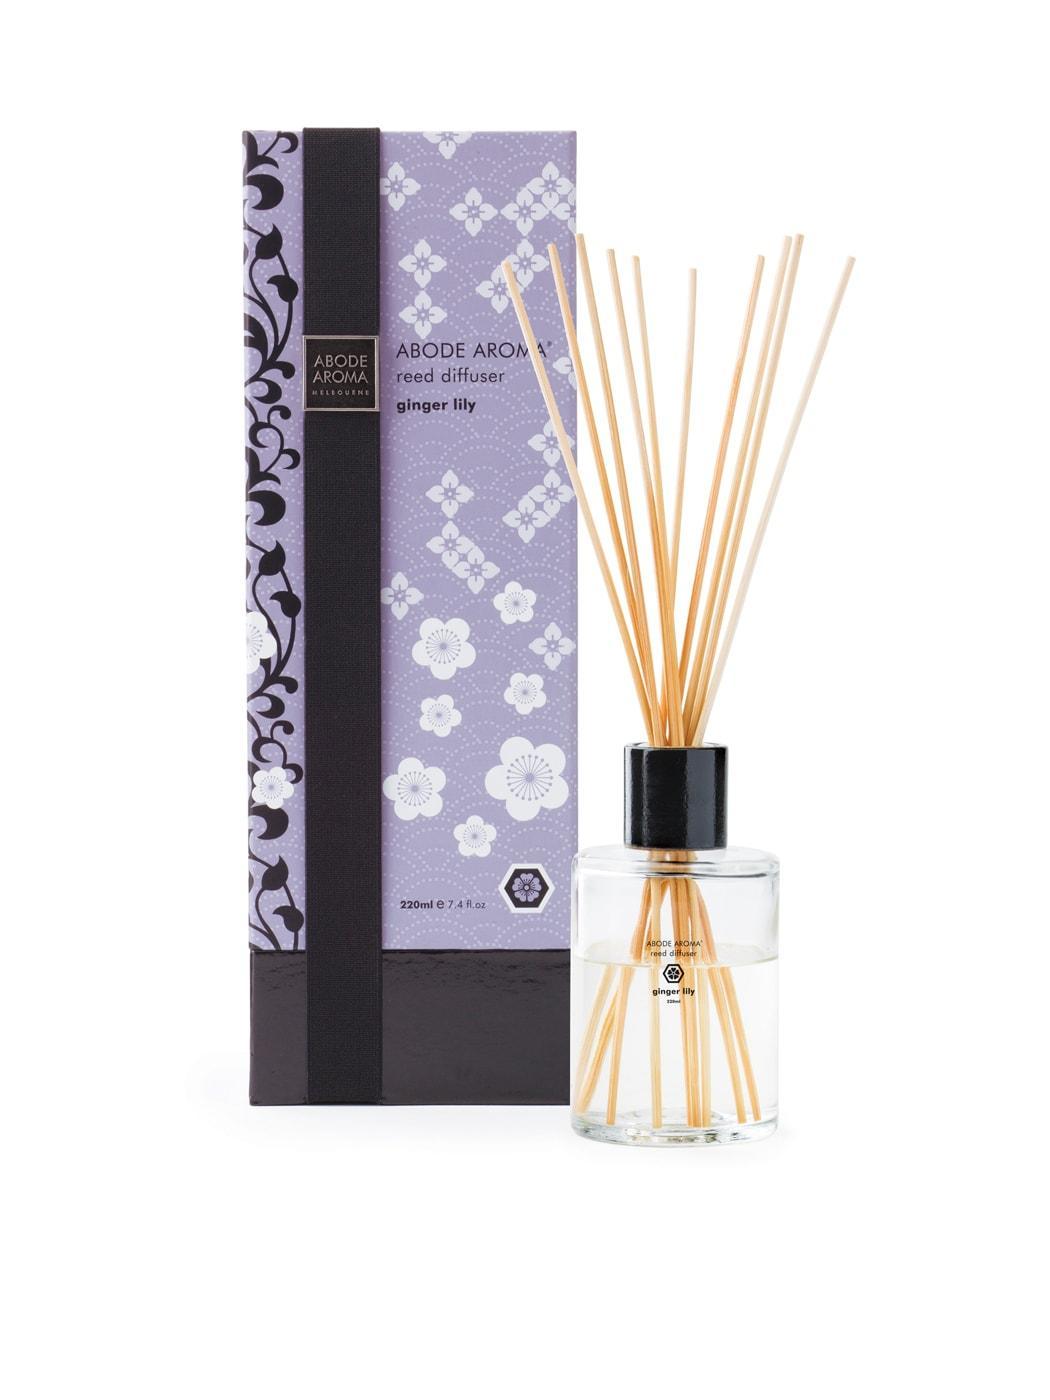 Abode Aroma Kimono 220ml Diffuser Ginger Lily/Green Tea/Yuzu Flower/Black Musk